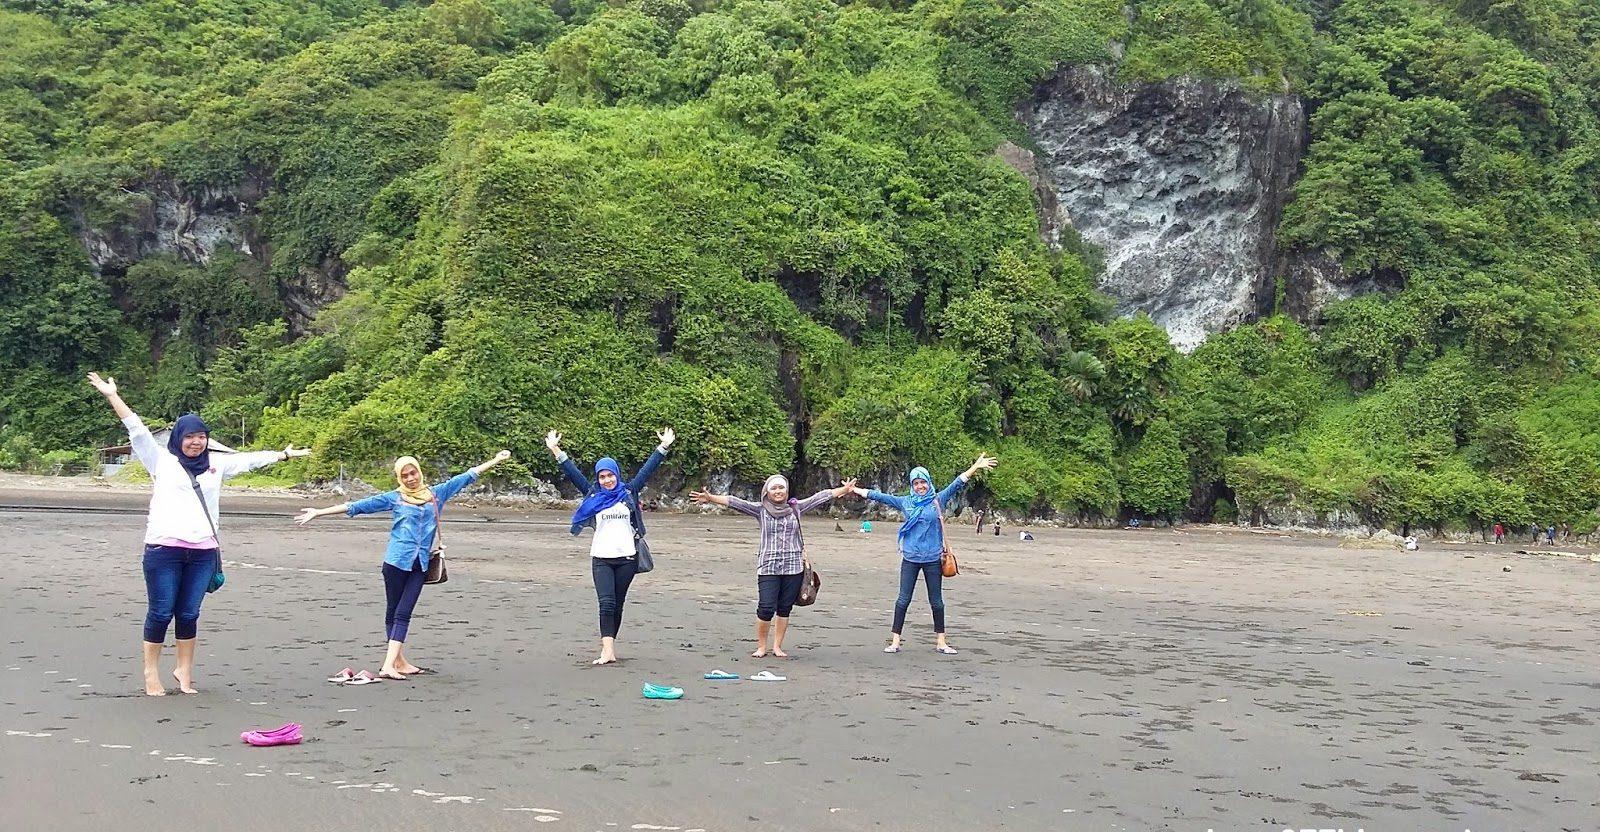 Obyek Wisata Pantai Sodong Cilacap Jawa Tengah Kab